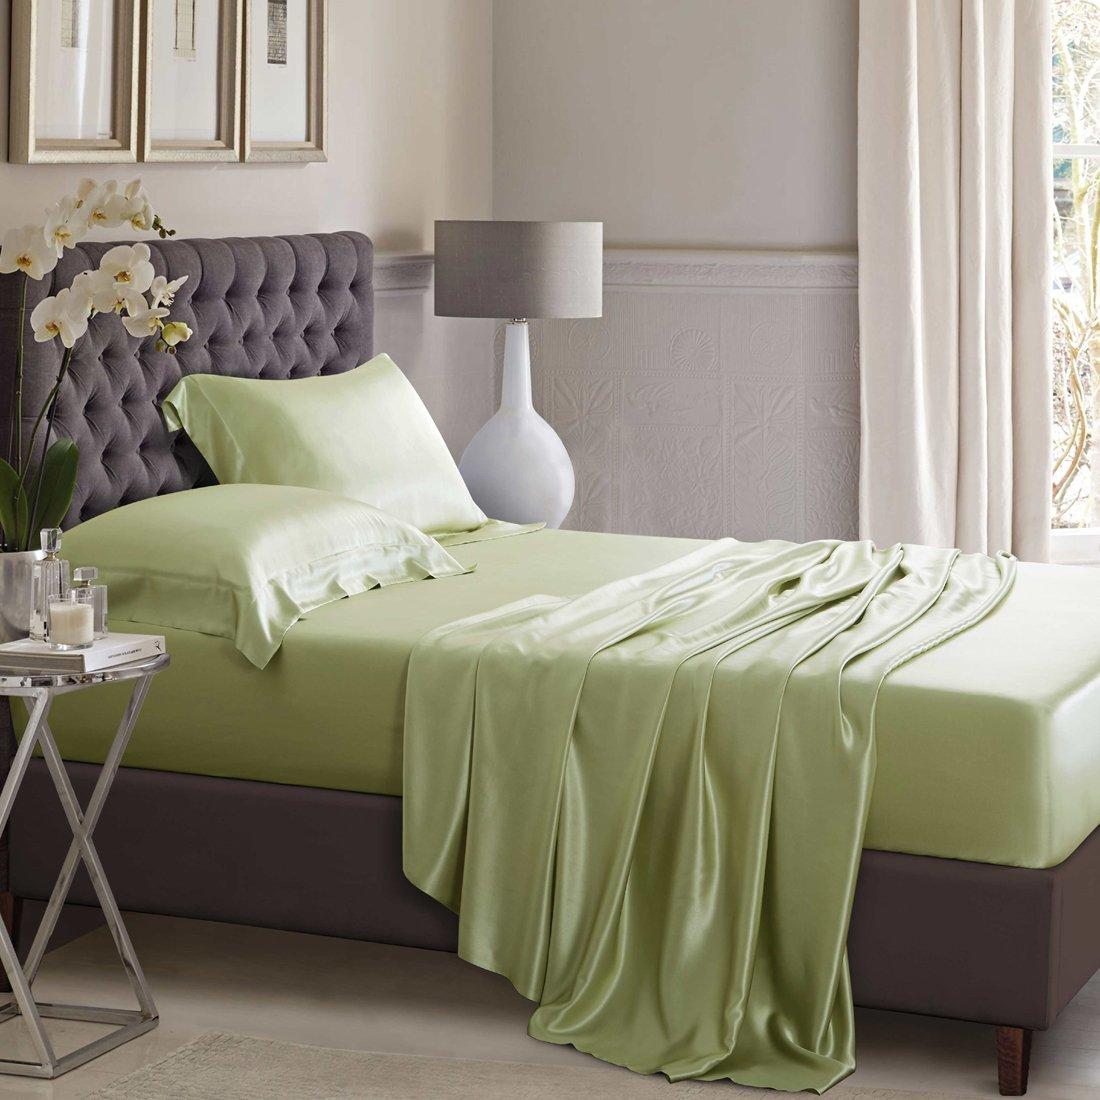 ELLESILK Sage Green Pure Silk Sheet Set, 25 Momme Seamless Mulberry Silk, Hypoallergenic, King Size